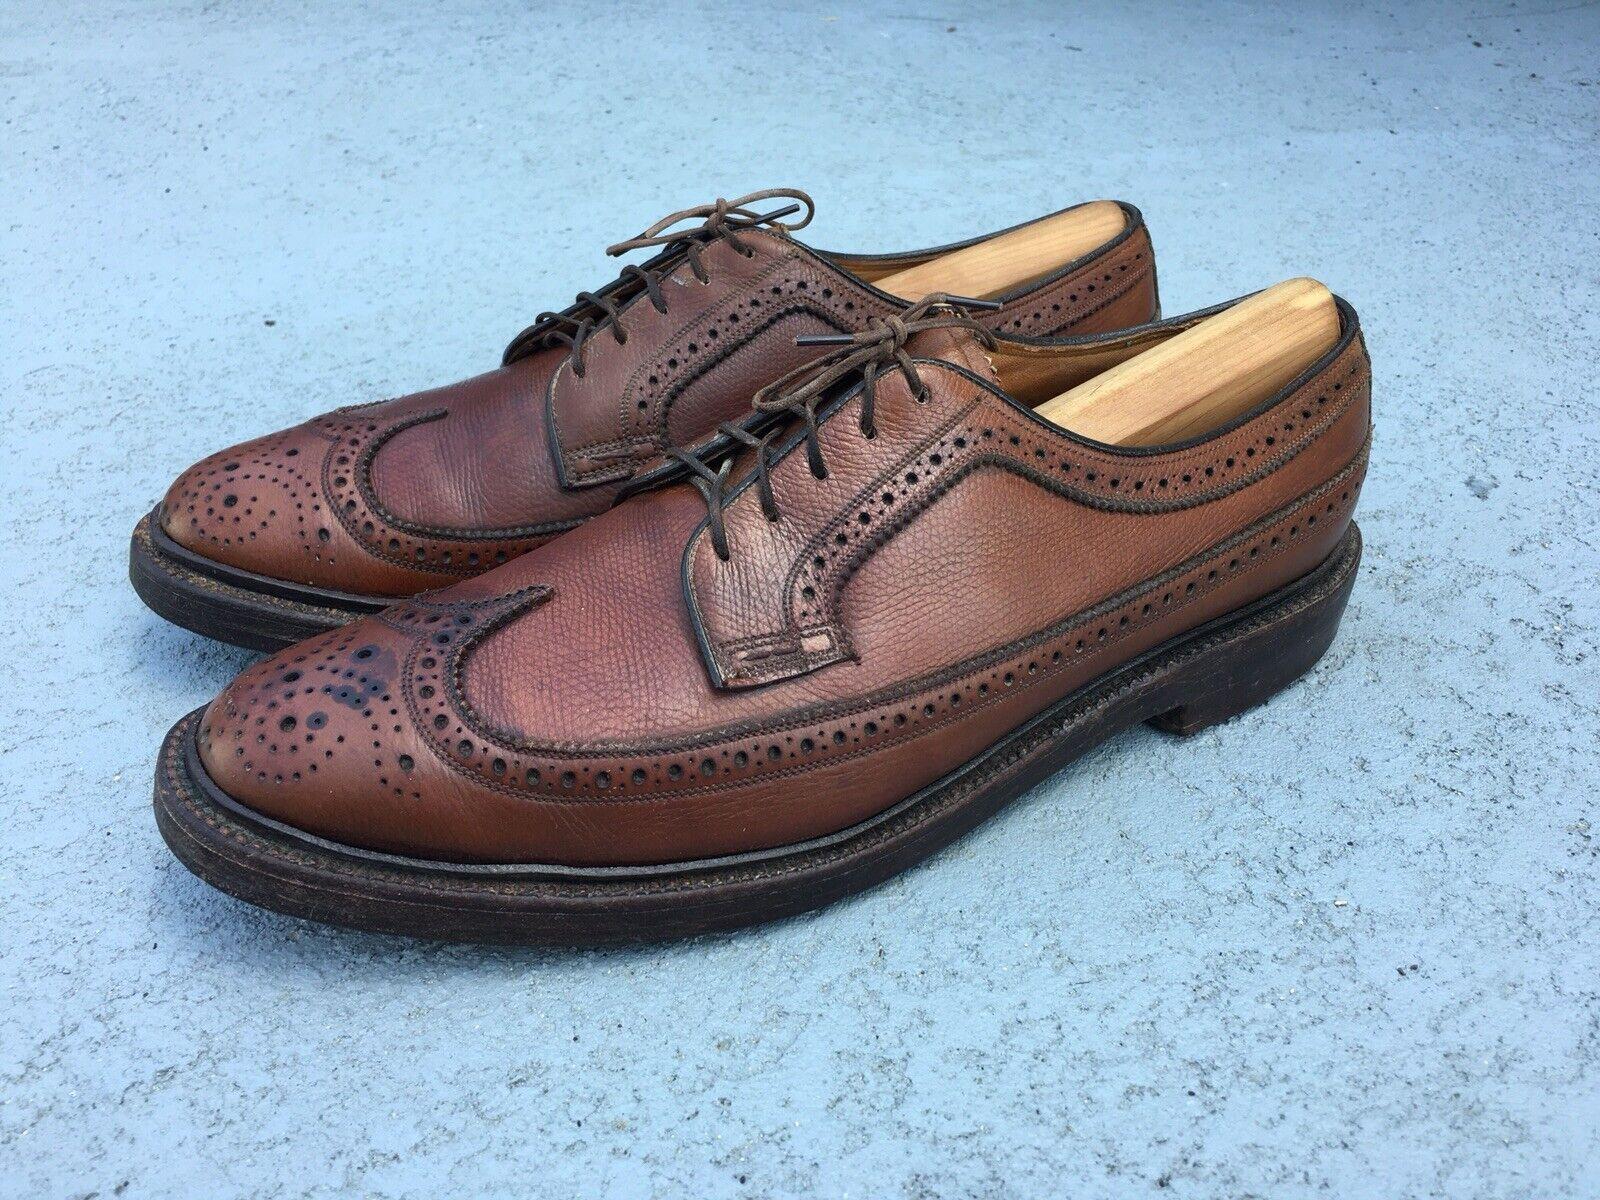 Florsheim Vintage USA Brown Grain Leather 5 Nail V Cleat Long Wingtips SZ 9.5 C